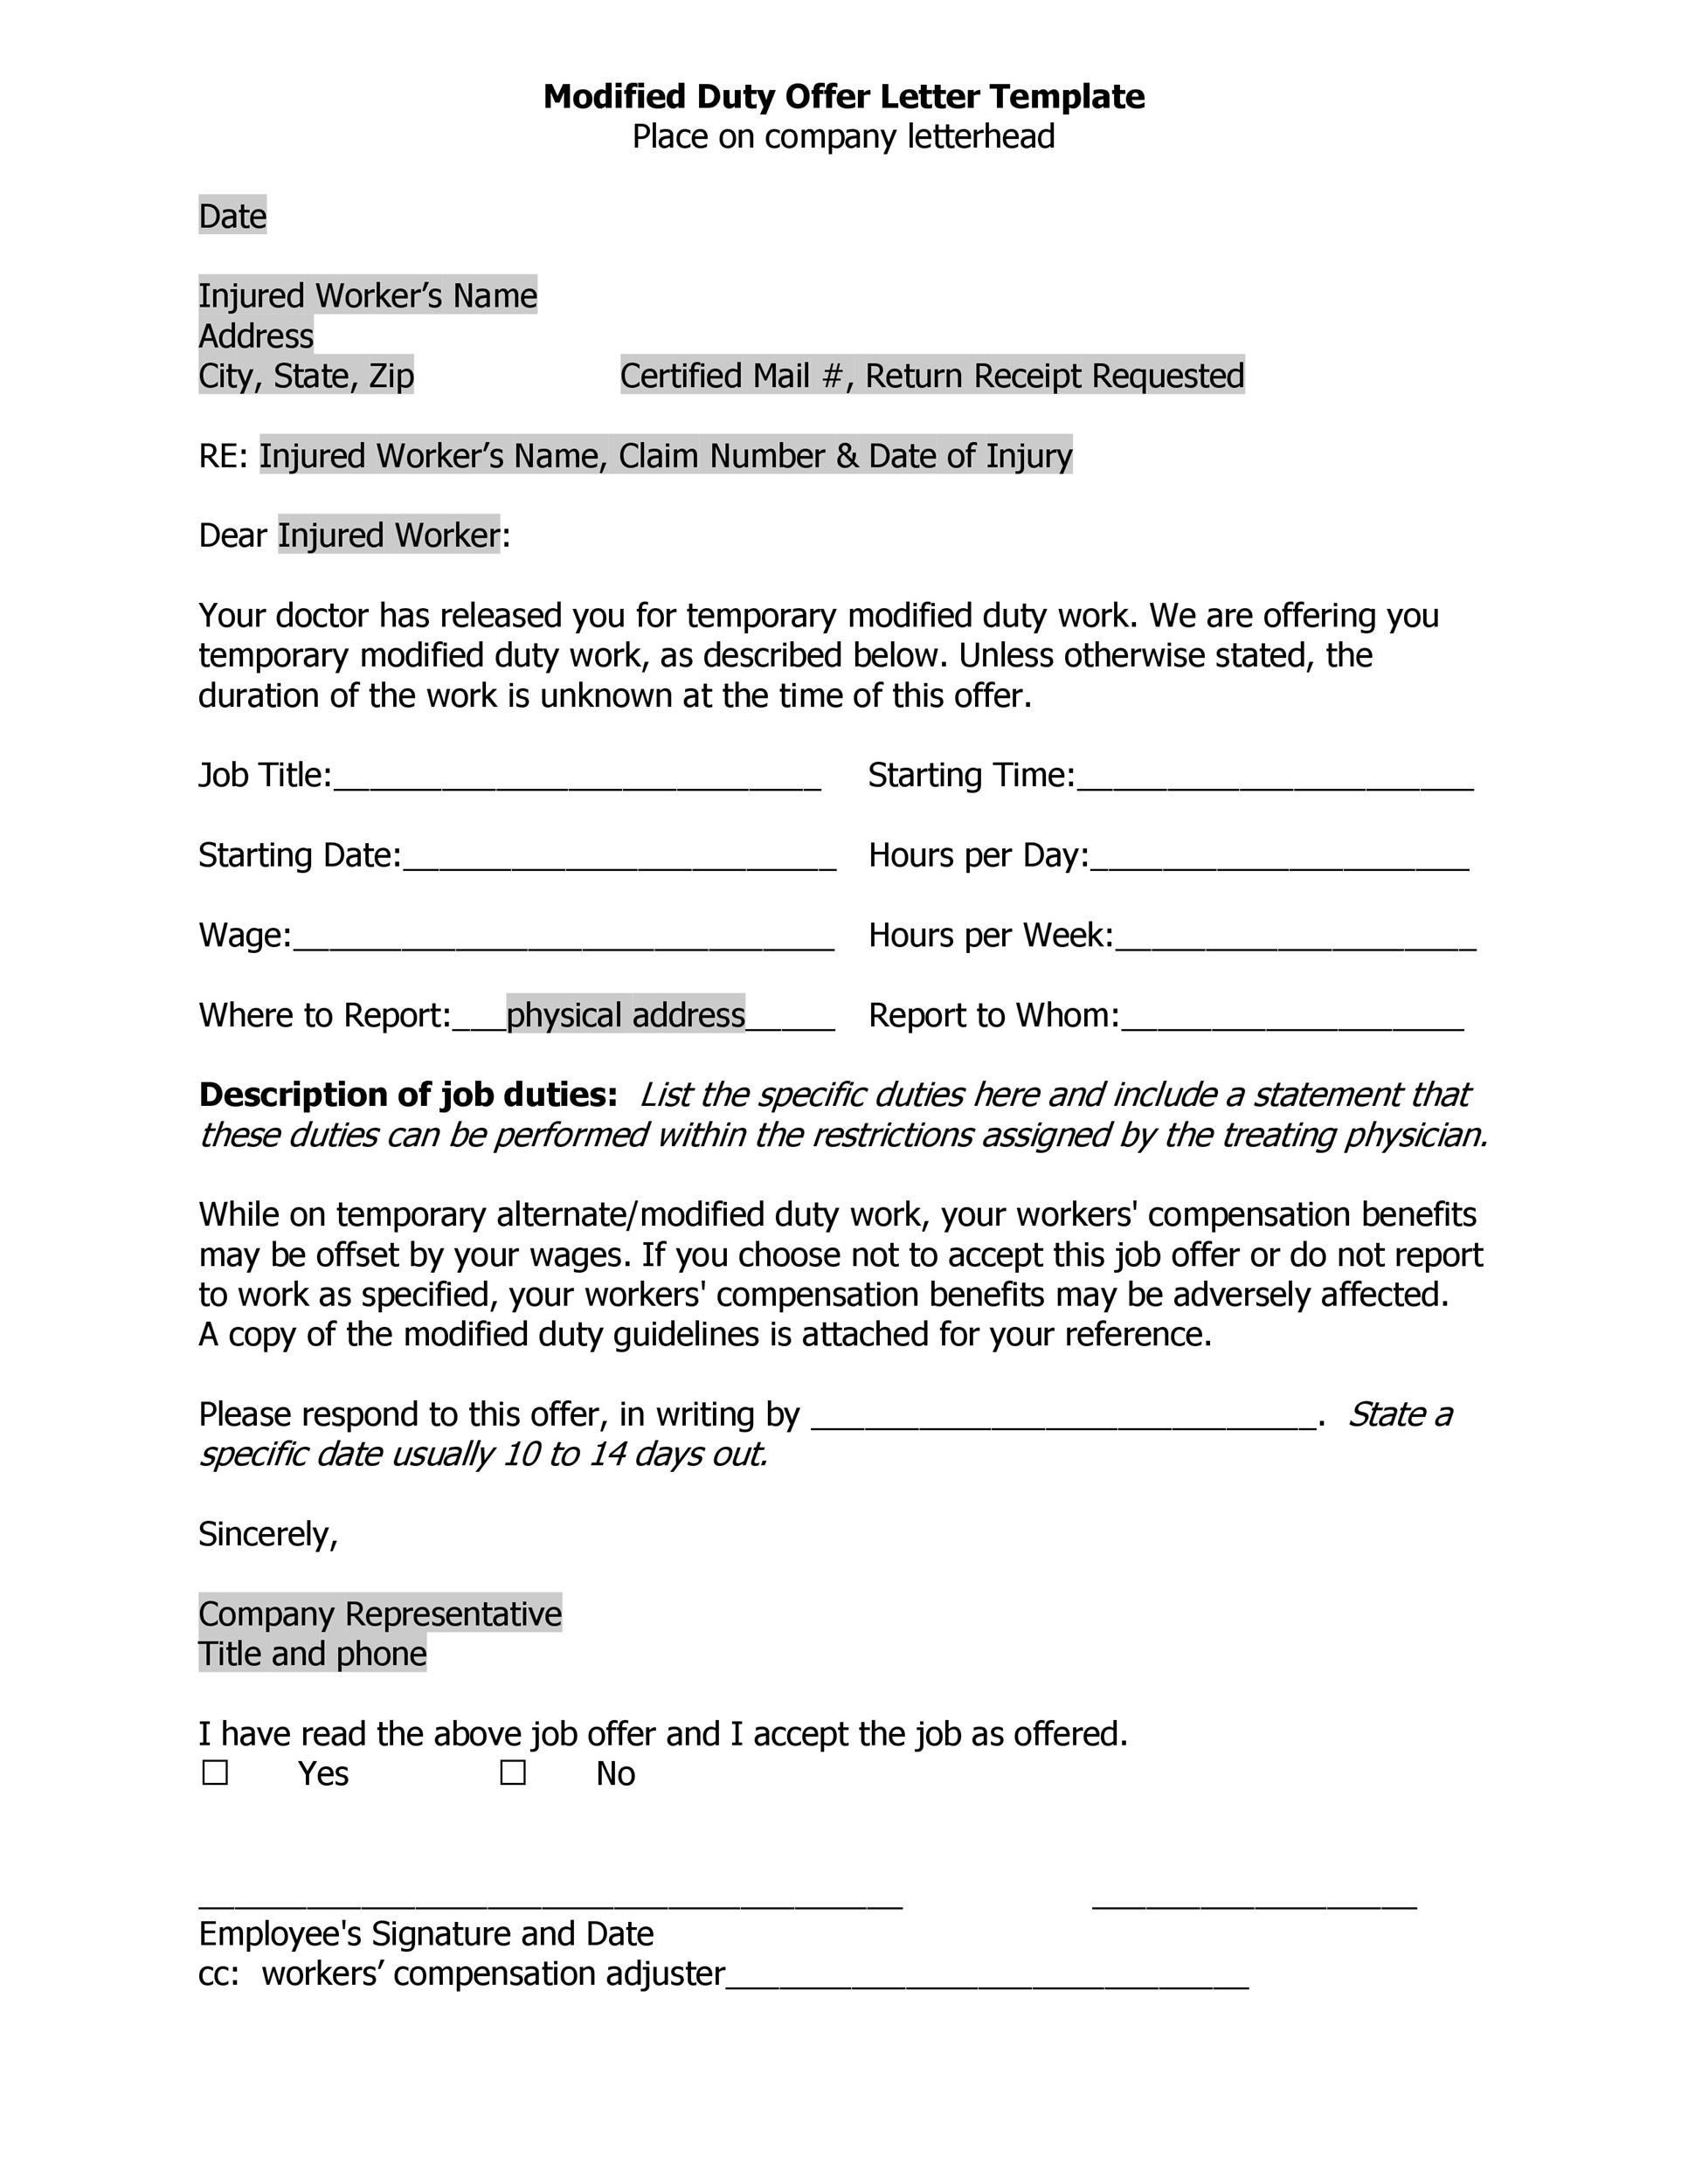 I want to write a resume